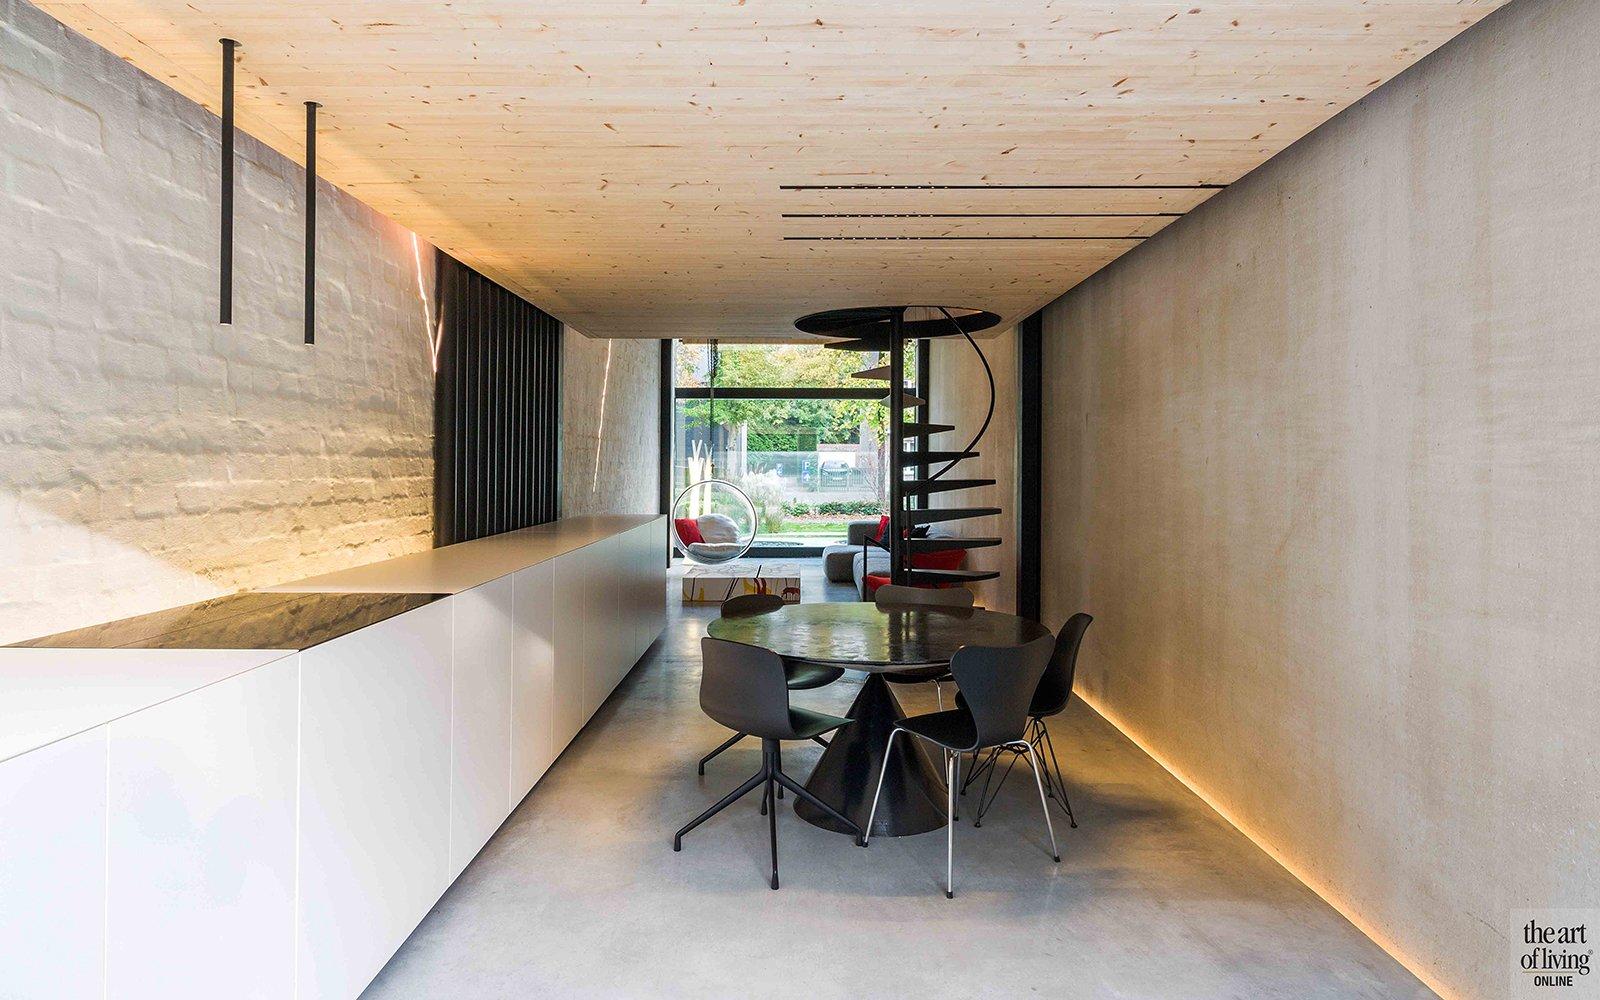 Icoon Architecten, keuken, eettafel, trap, strak, open ruimten, woonkamer